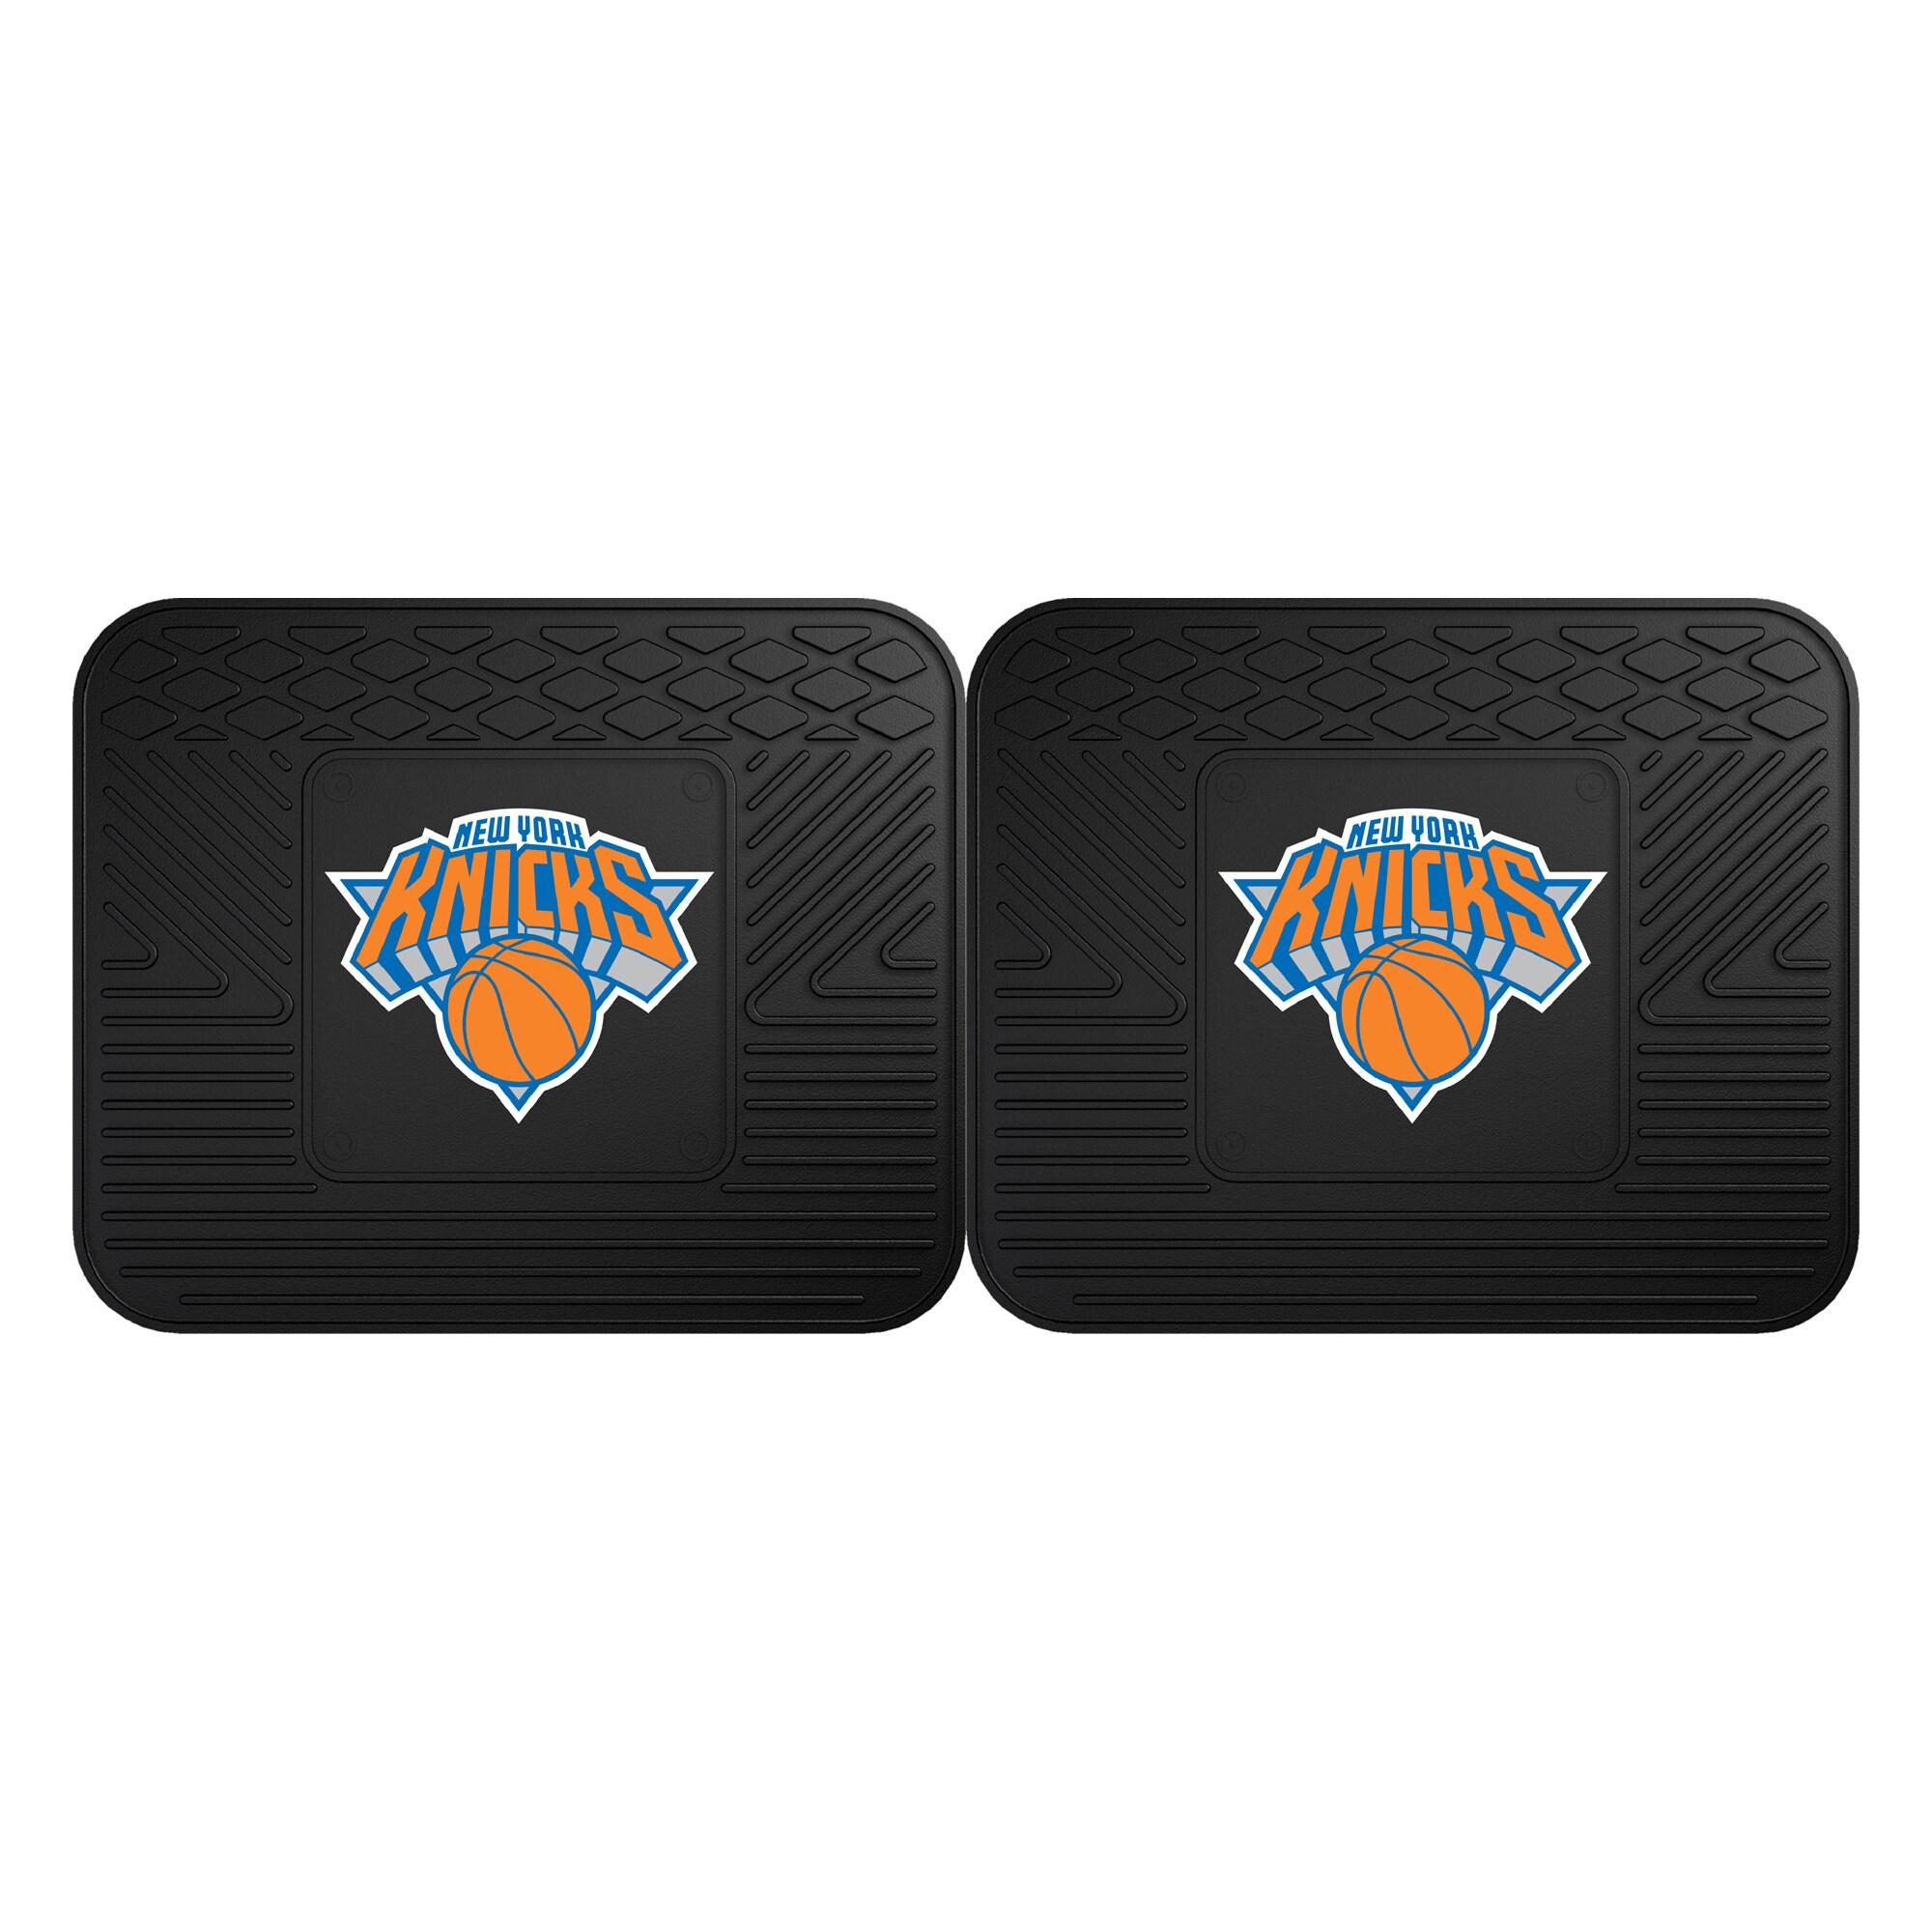 New York Knicks 2-Pack Utility Mat Set